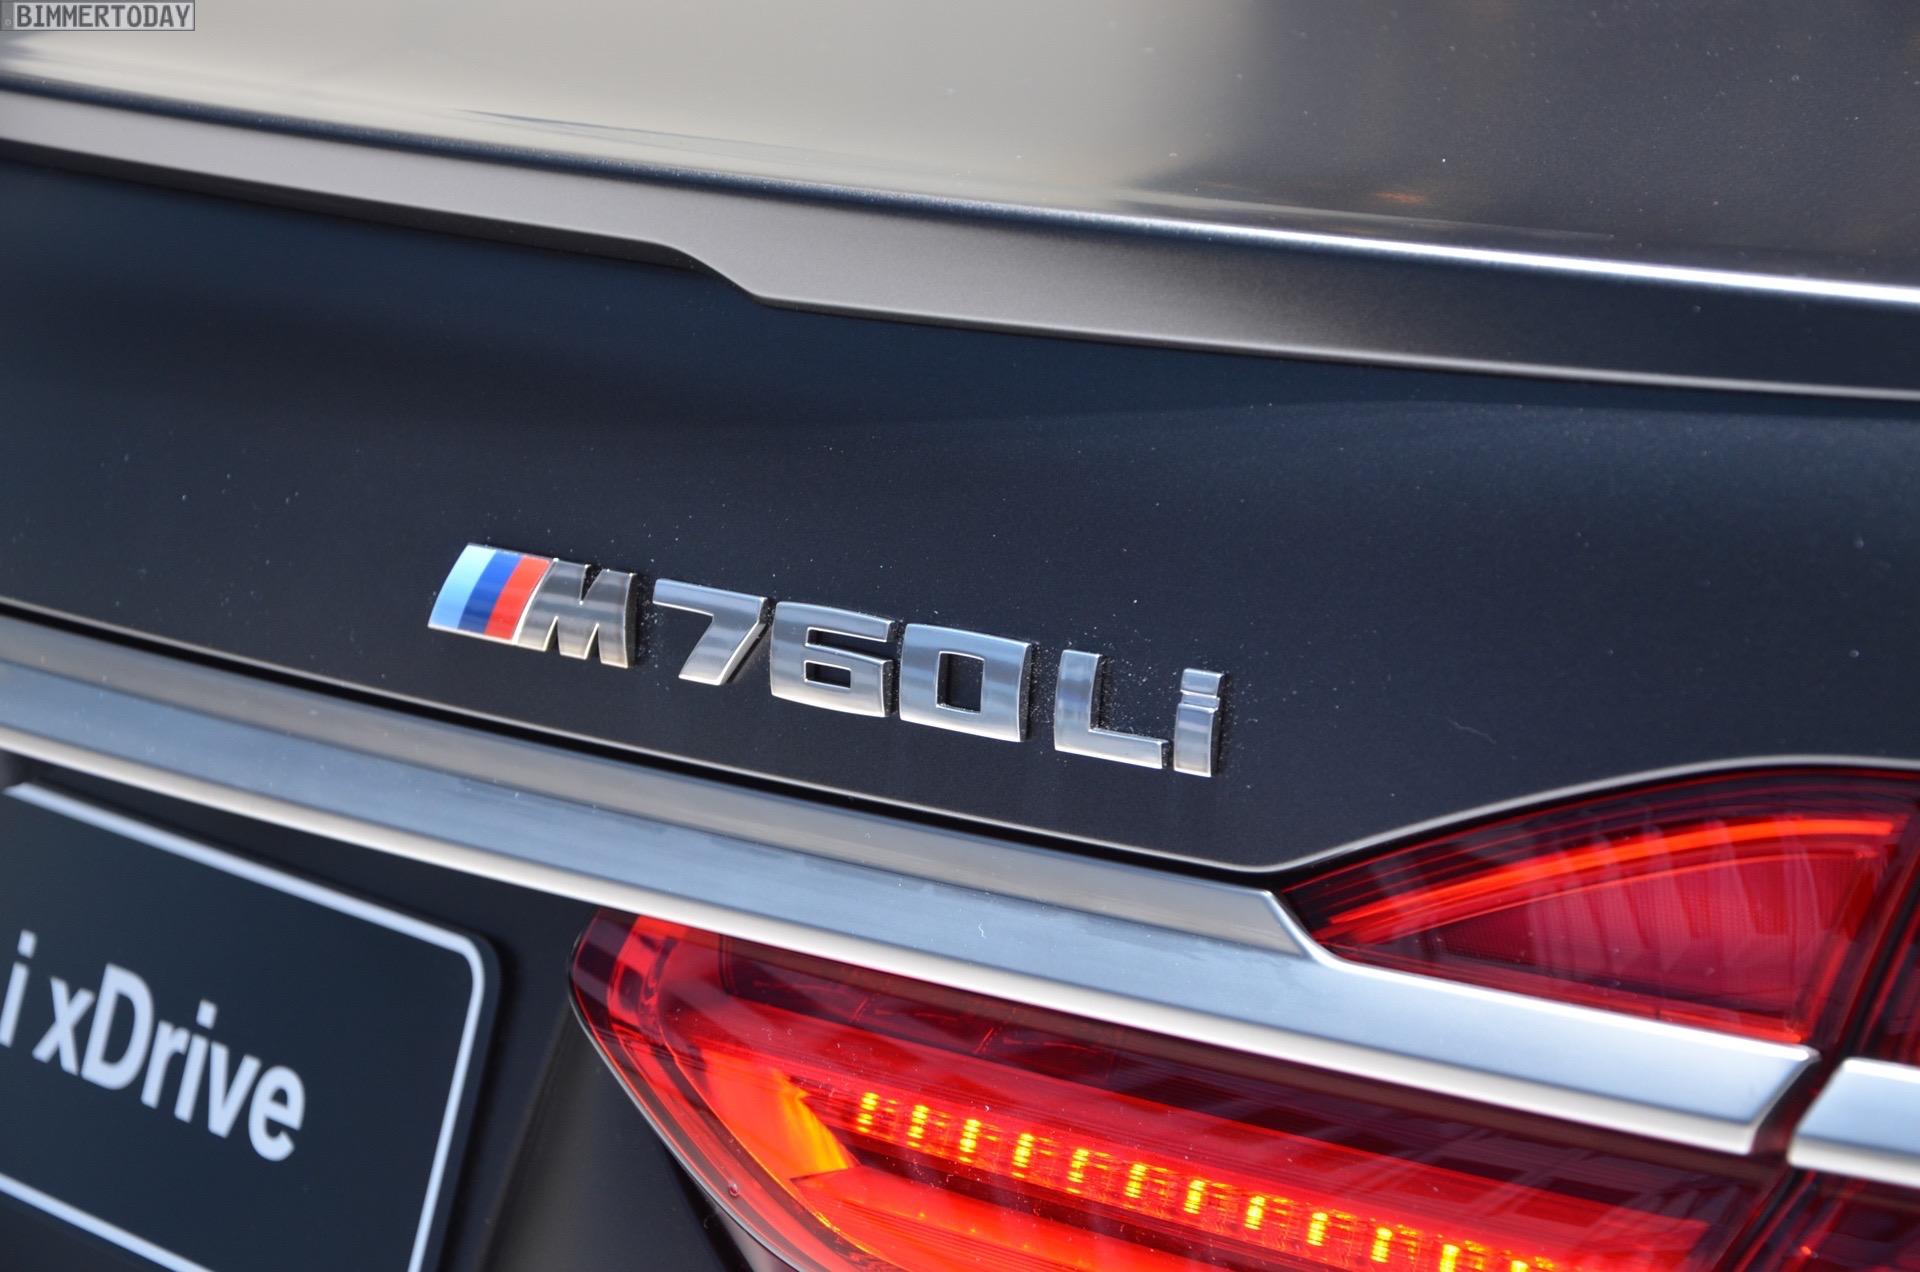 BMW M760Li G12 V12 xDrive 7er 2016 Frozen Dark Brown Genf Live 11